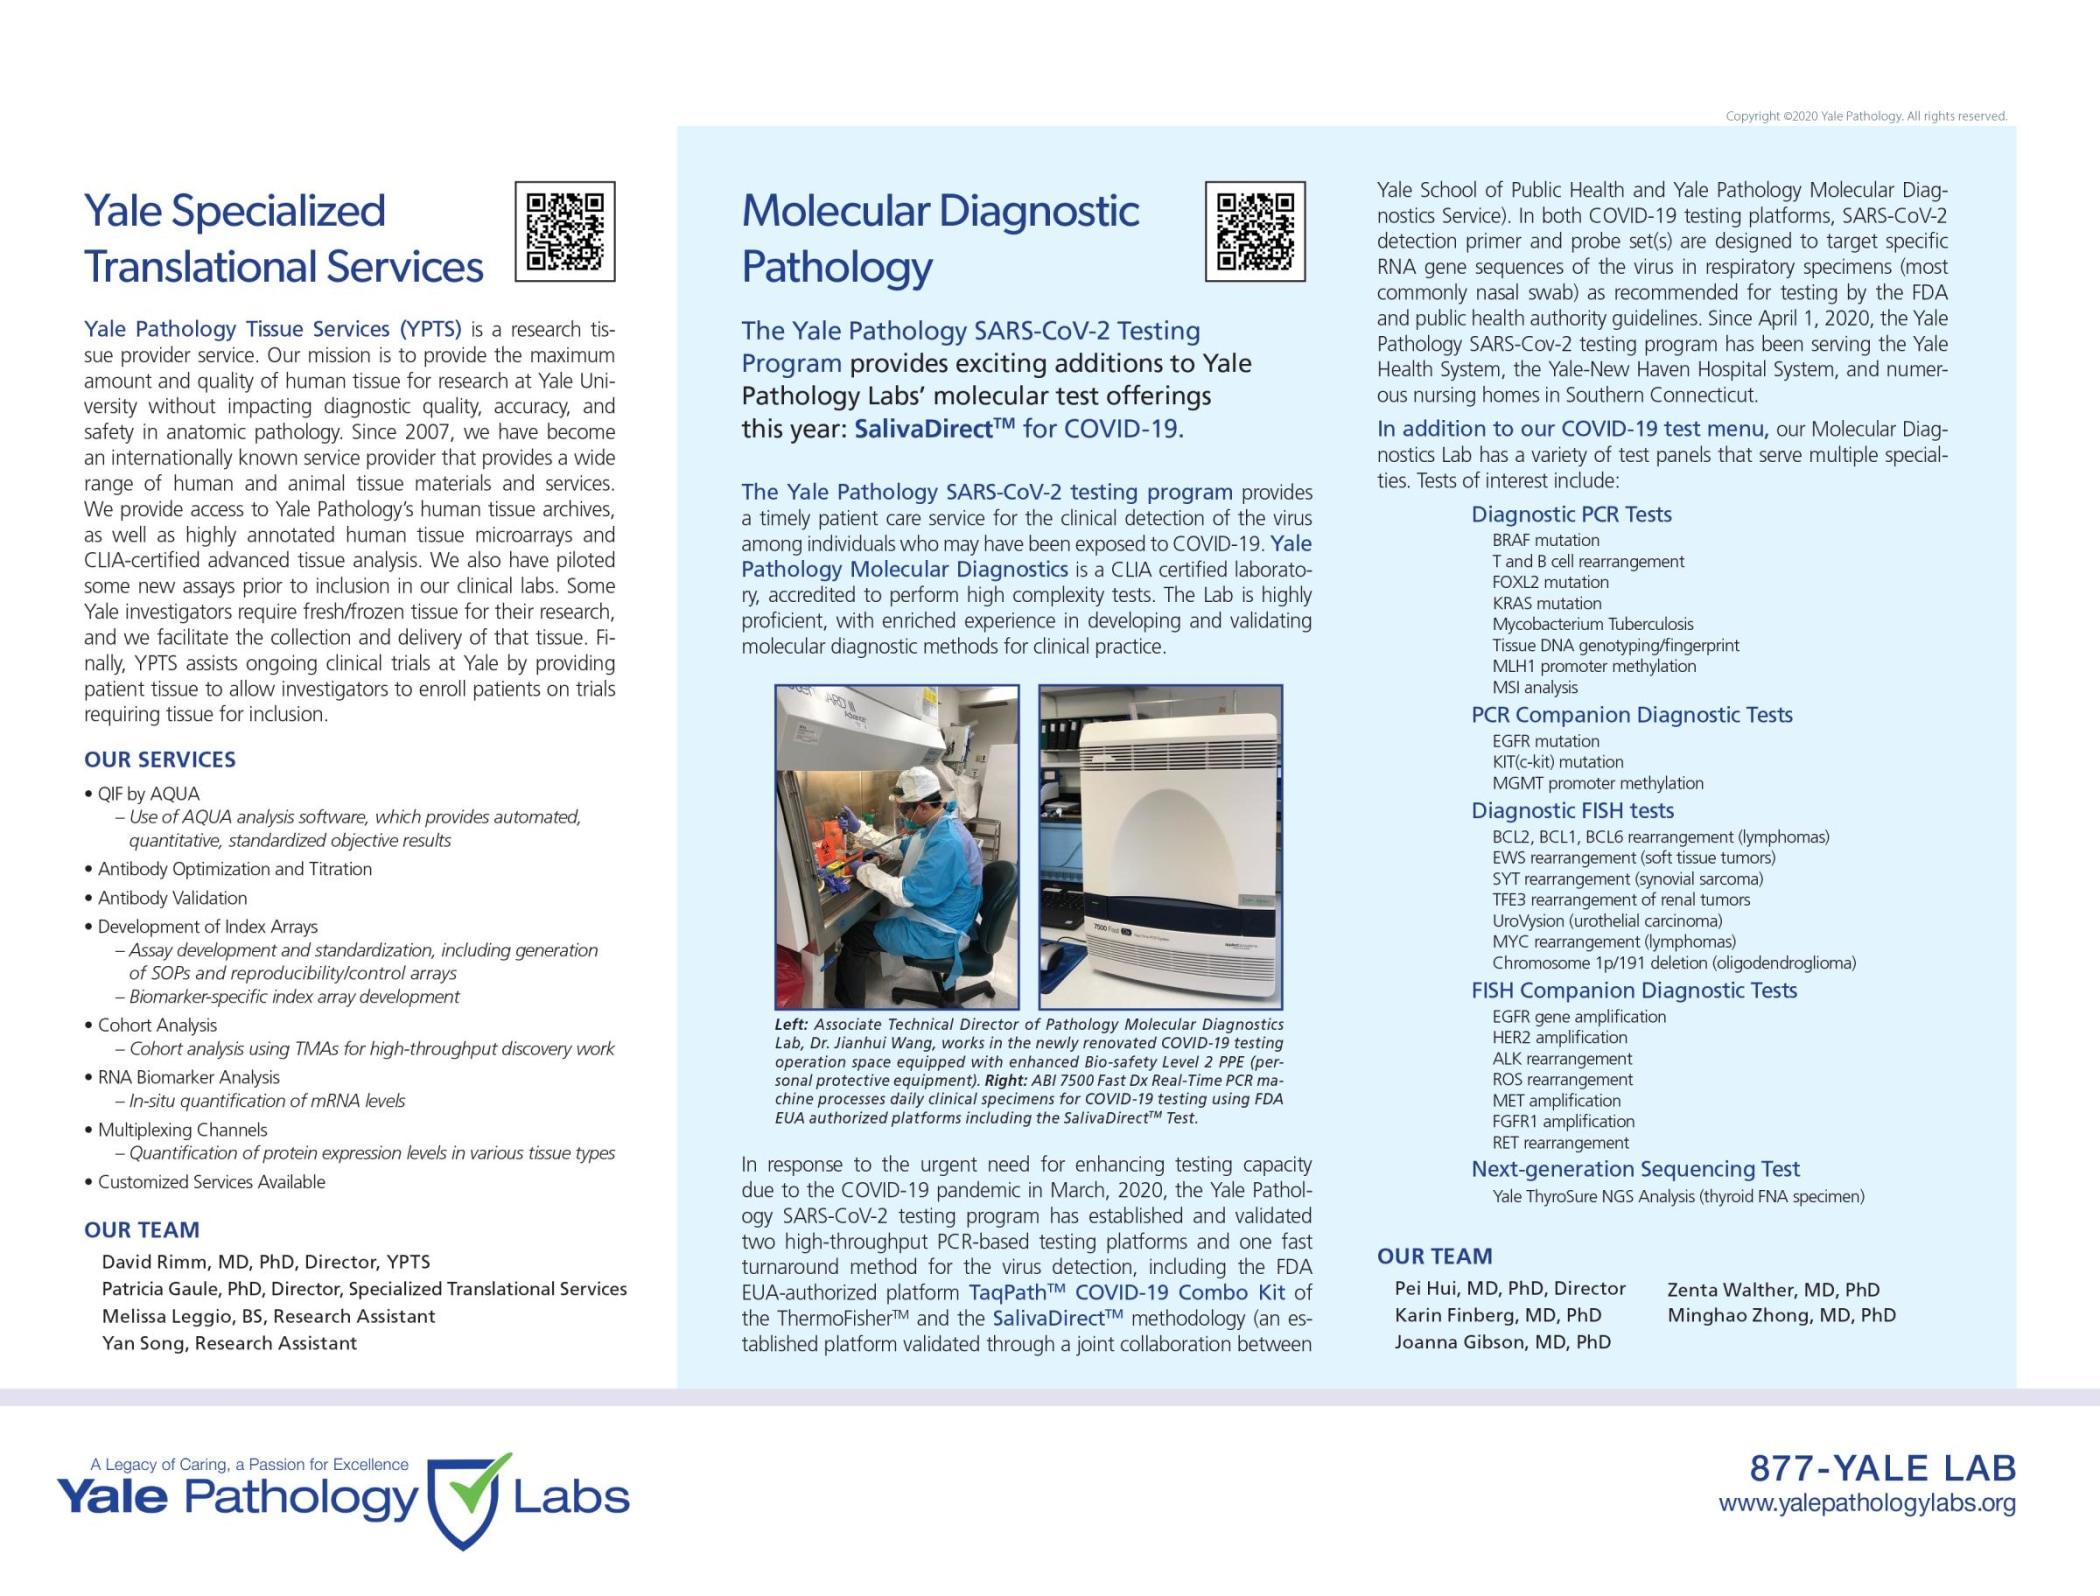 Yale Pathology Labs Calendar 2021 - Clinical Highlights